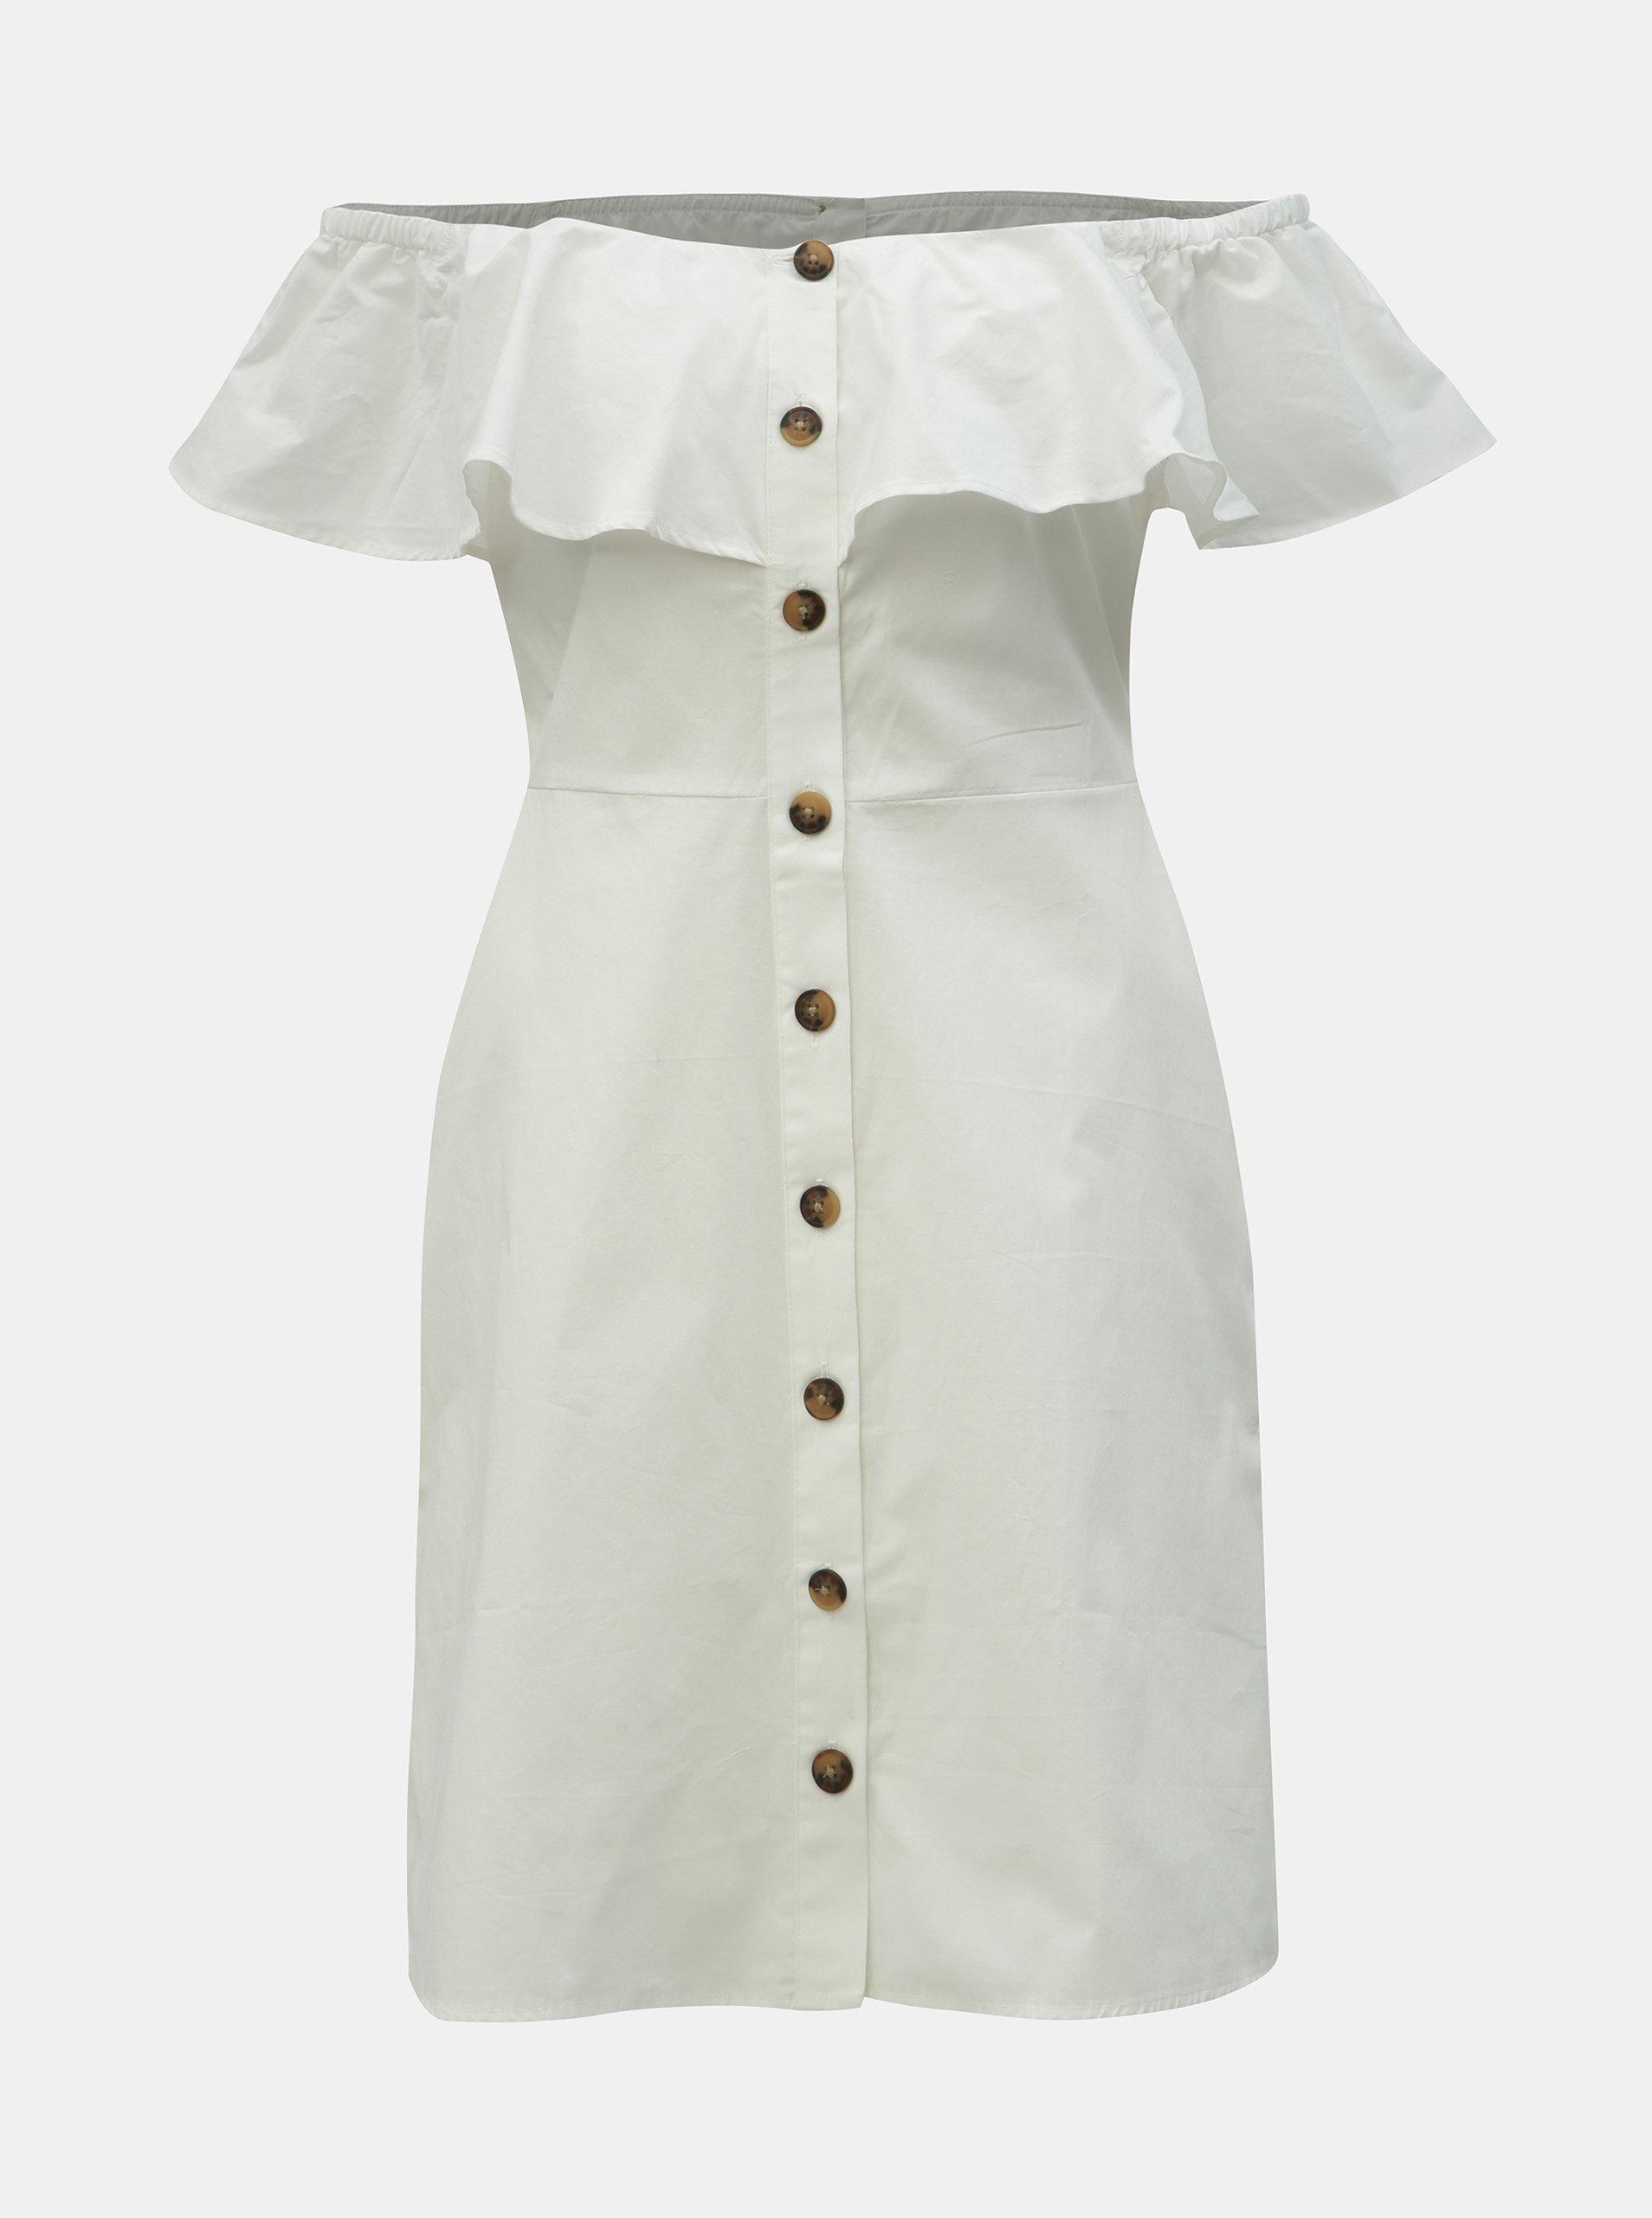 353aef366f13 Biele šaty s odhalenými ramenami Dorothy Perkins ...